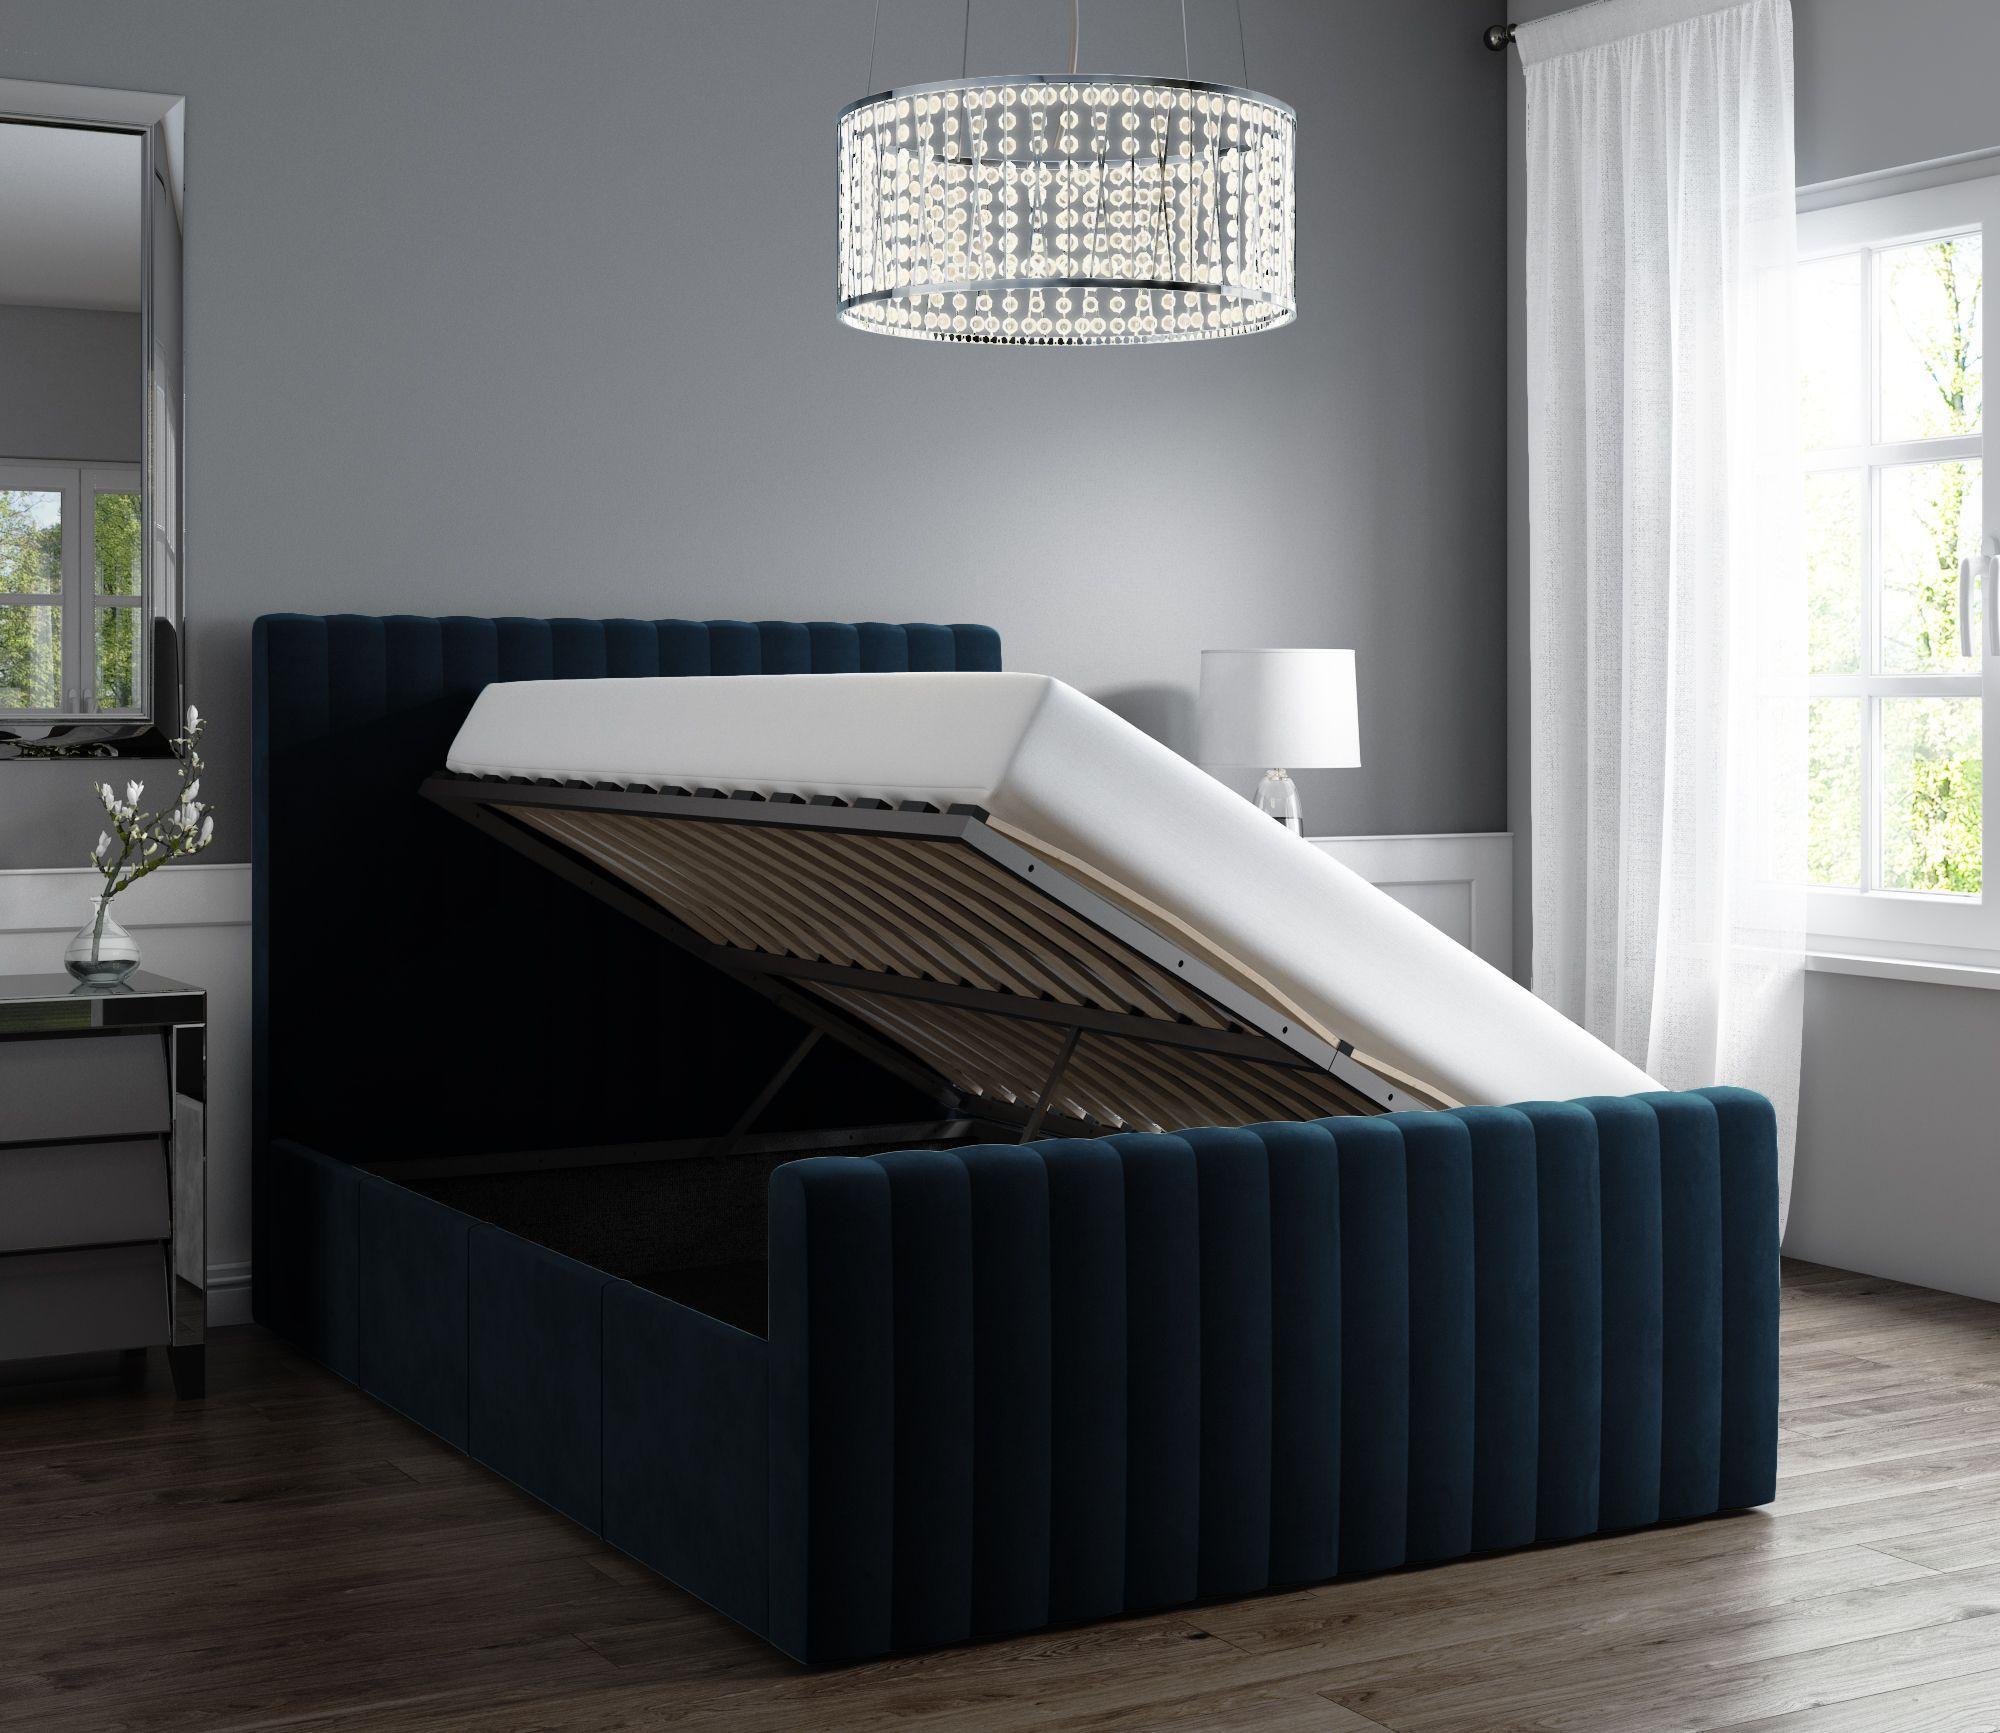 Surprising Khloe Double Side Ottoman Bed In Navy Blue Velvet Khl001 Creativecarmelina Interior Chair Design Creativecarmelinacom